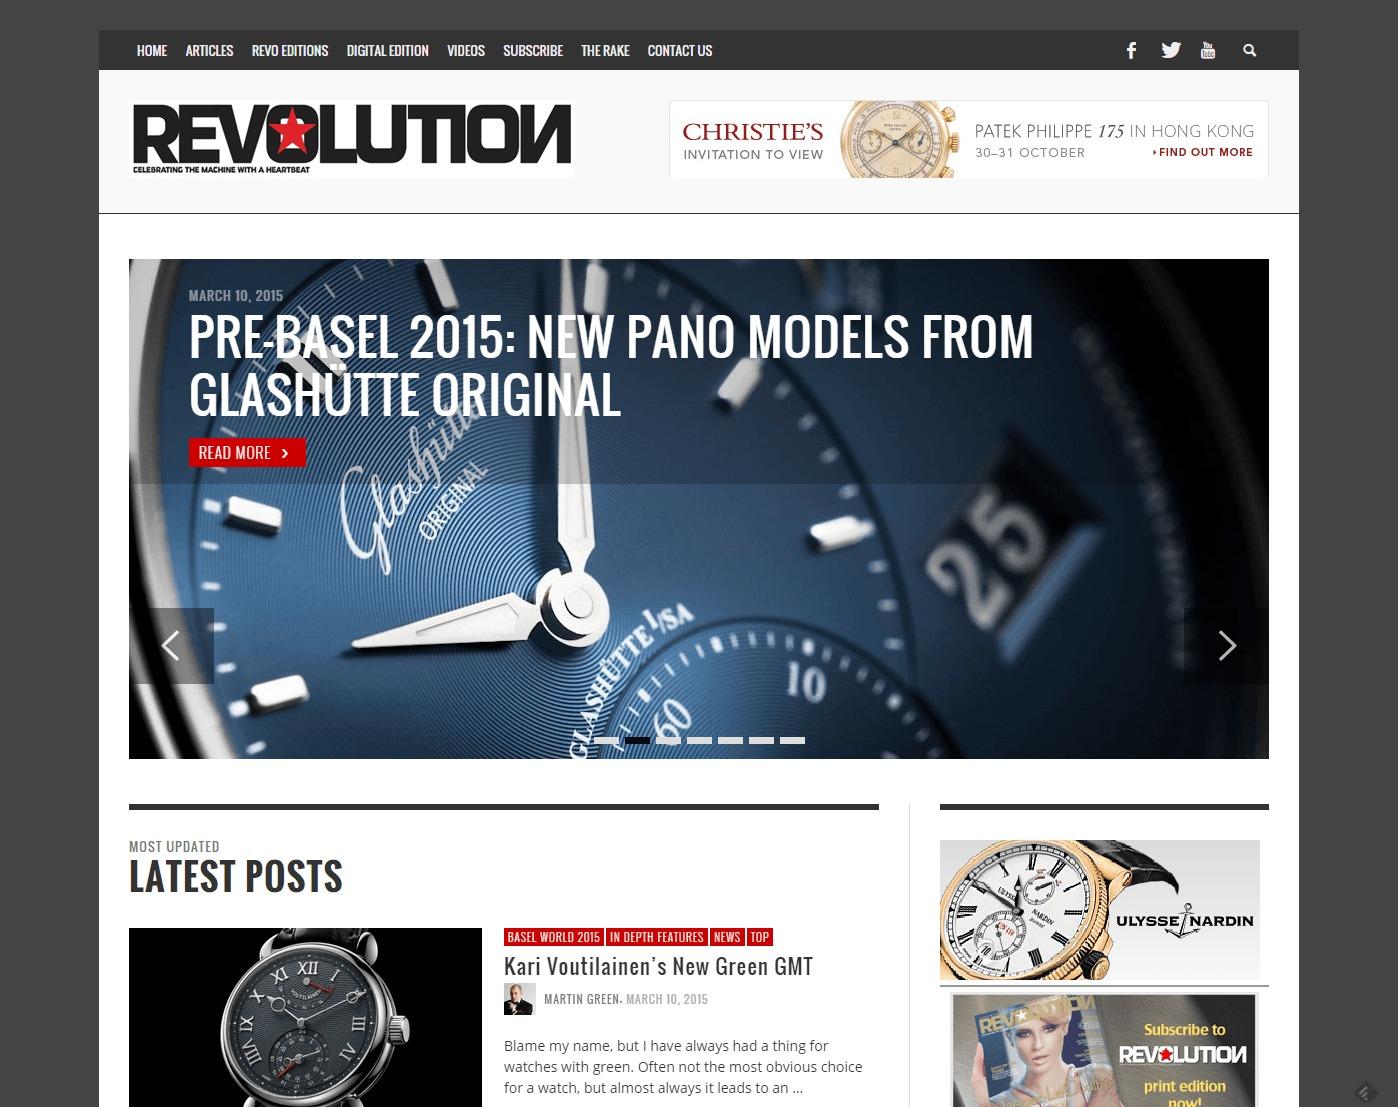 Revolution Press